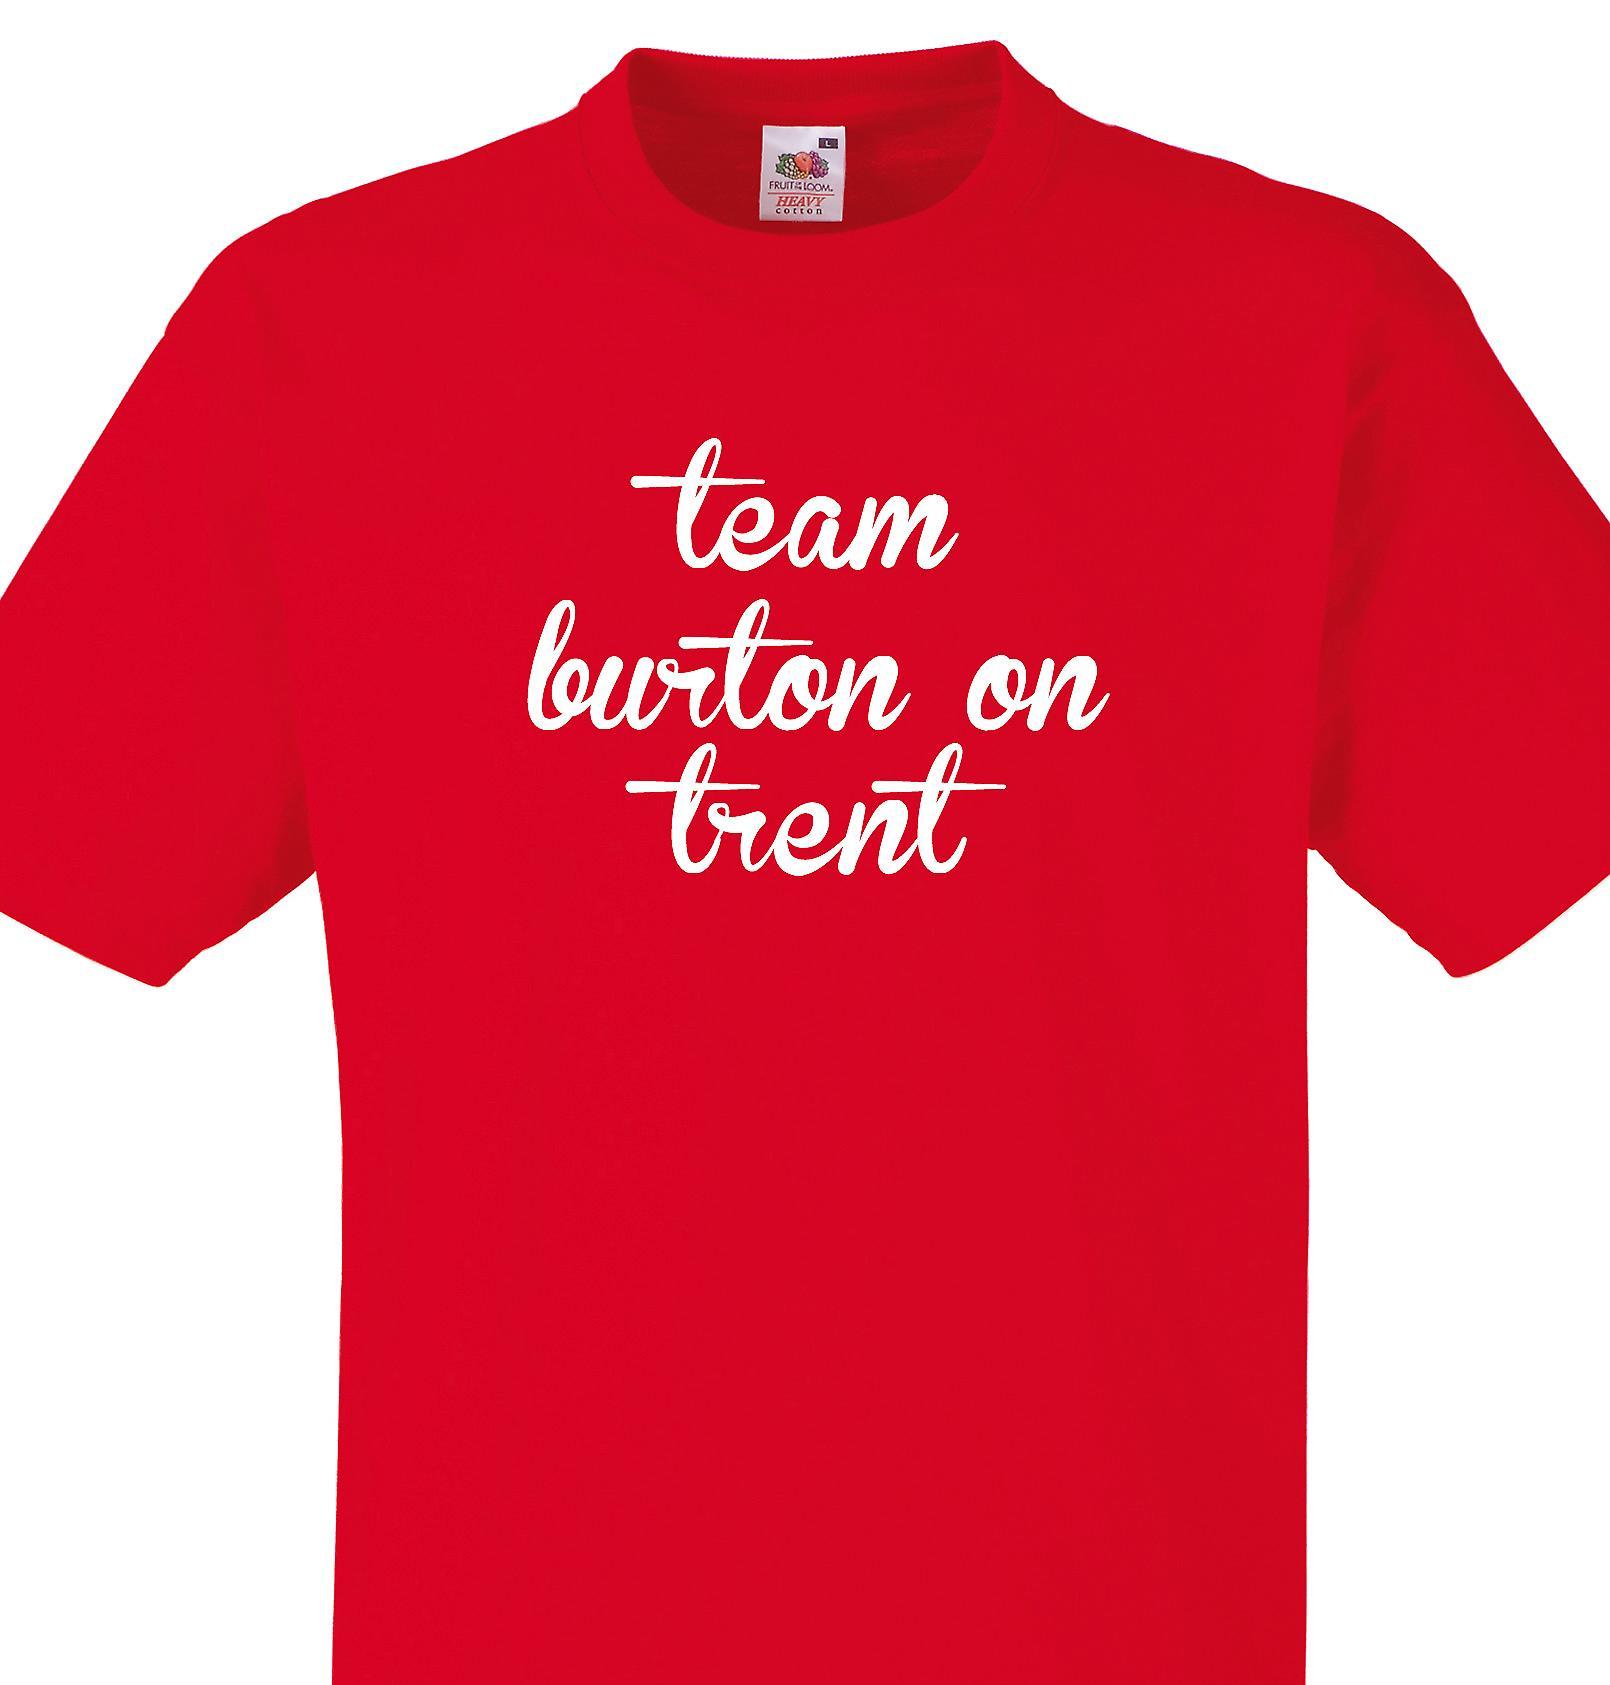 Team Burton on trent Red T shirt